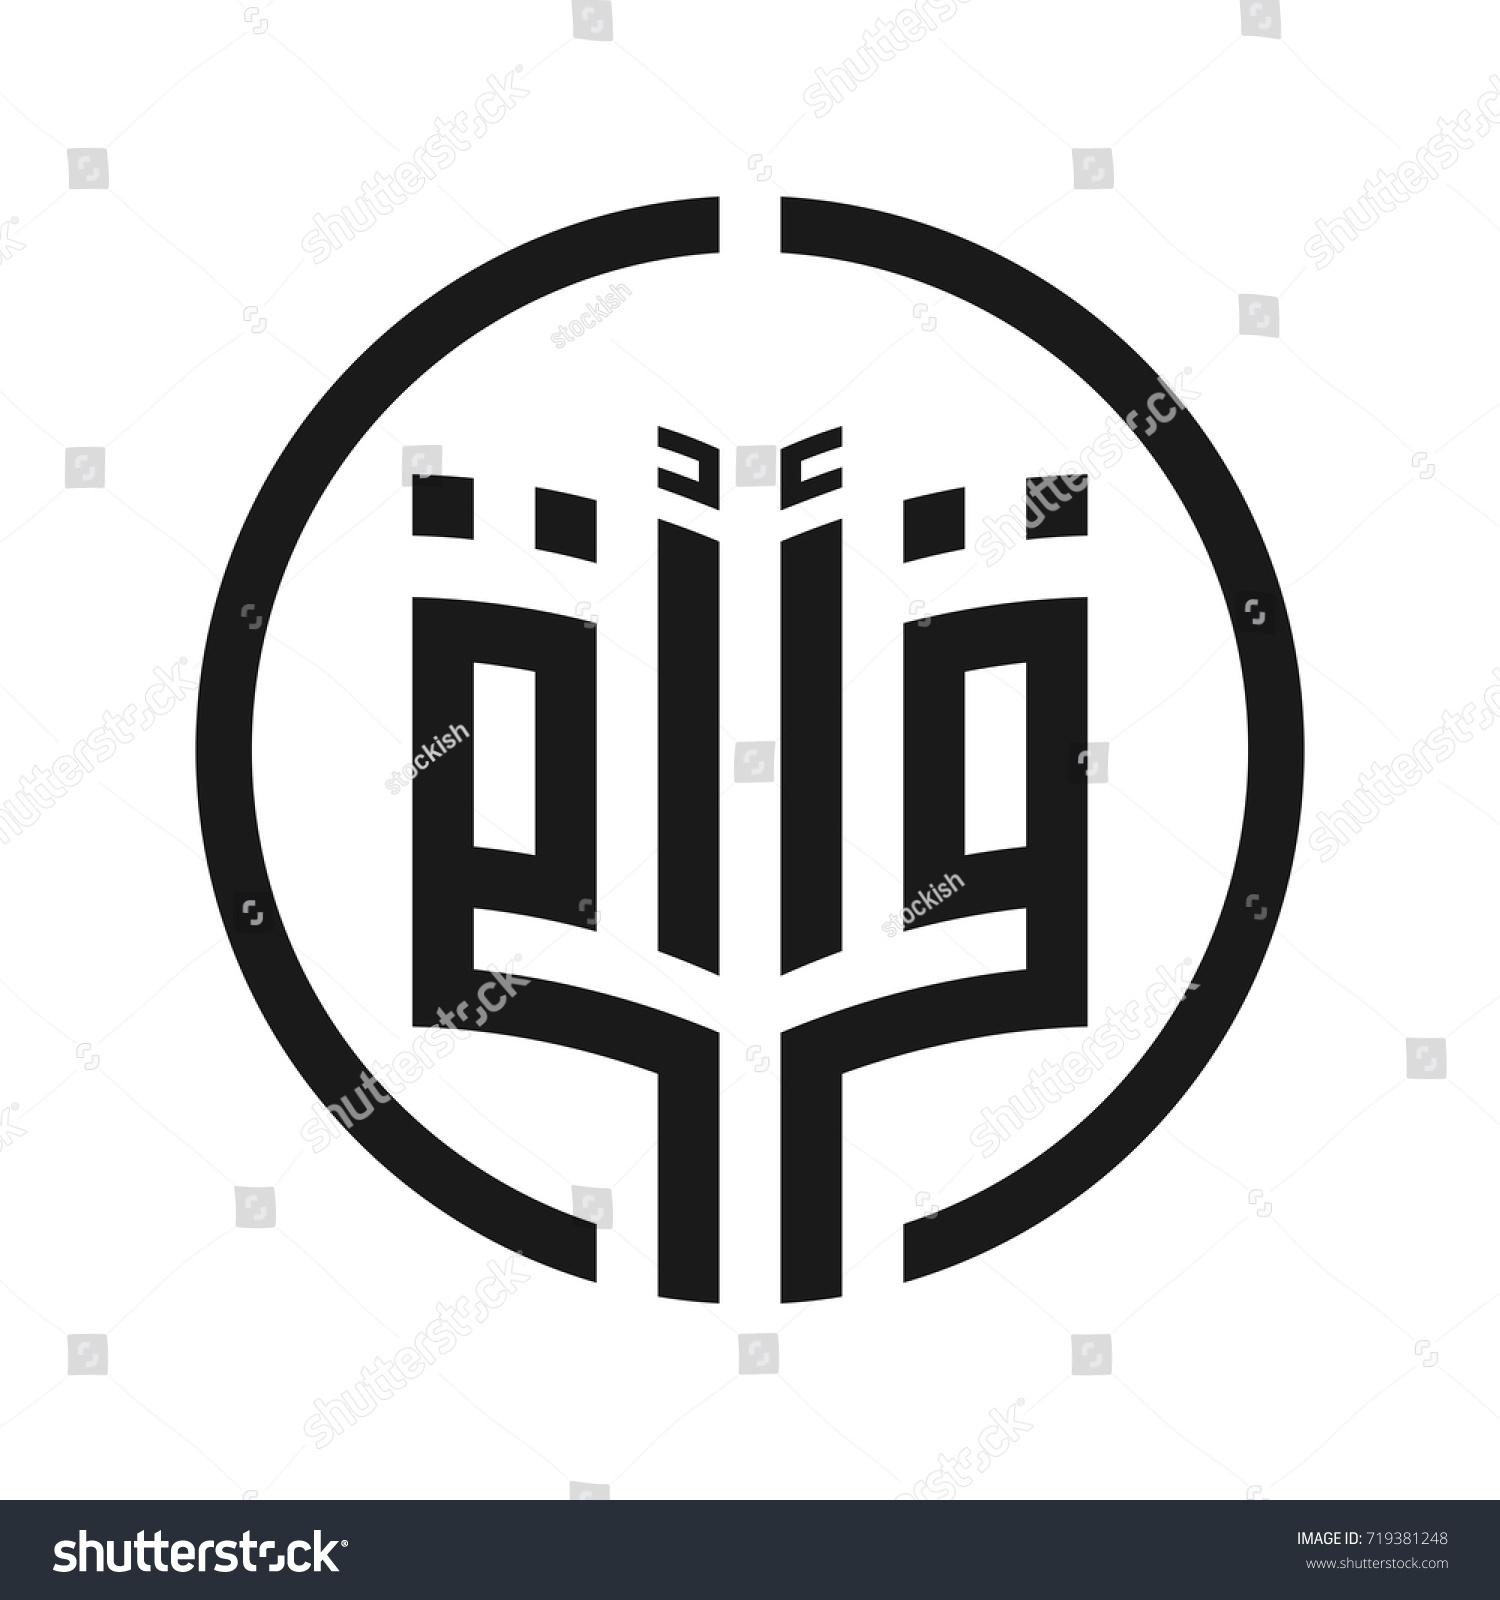 Arabic calligraphy logo iqra meaning iqra stock vector 719381248 arabic calligraphy logo of iqra the meaning iqra buycottarizona Image collections